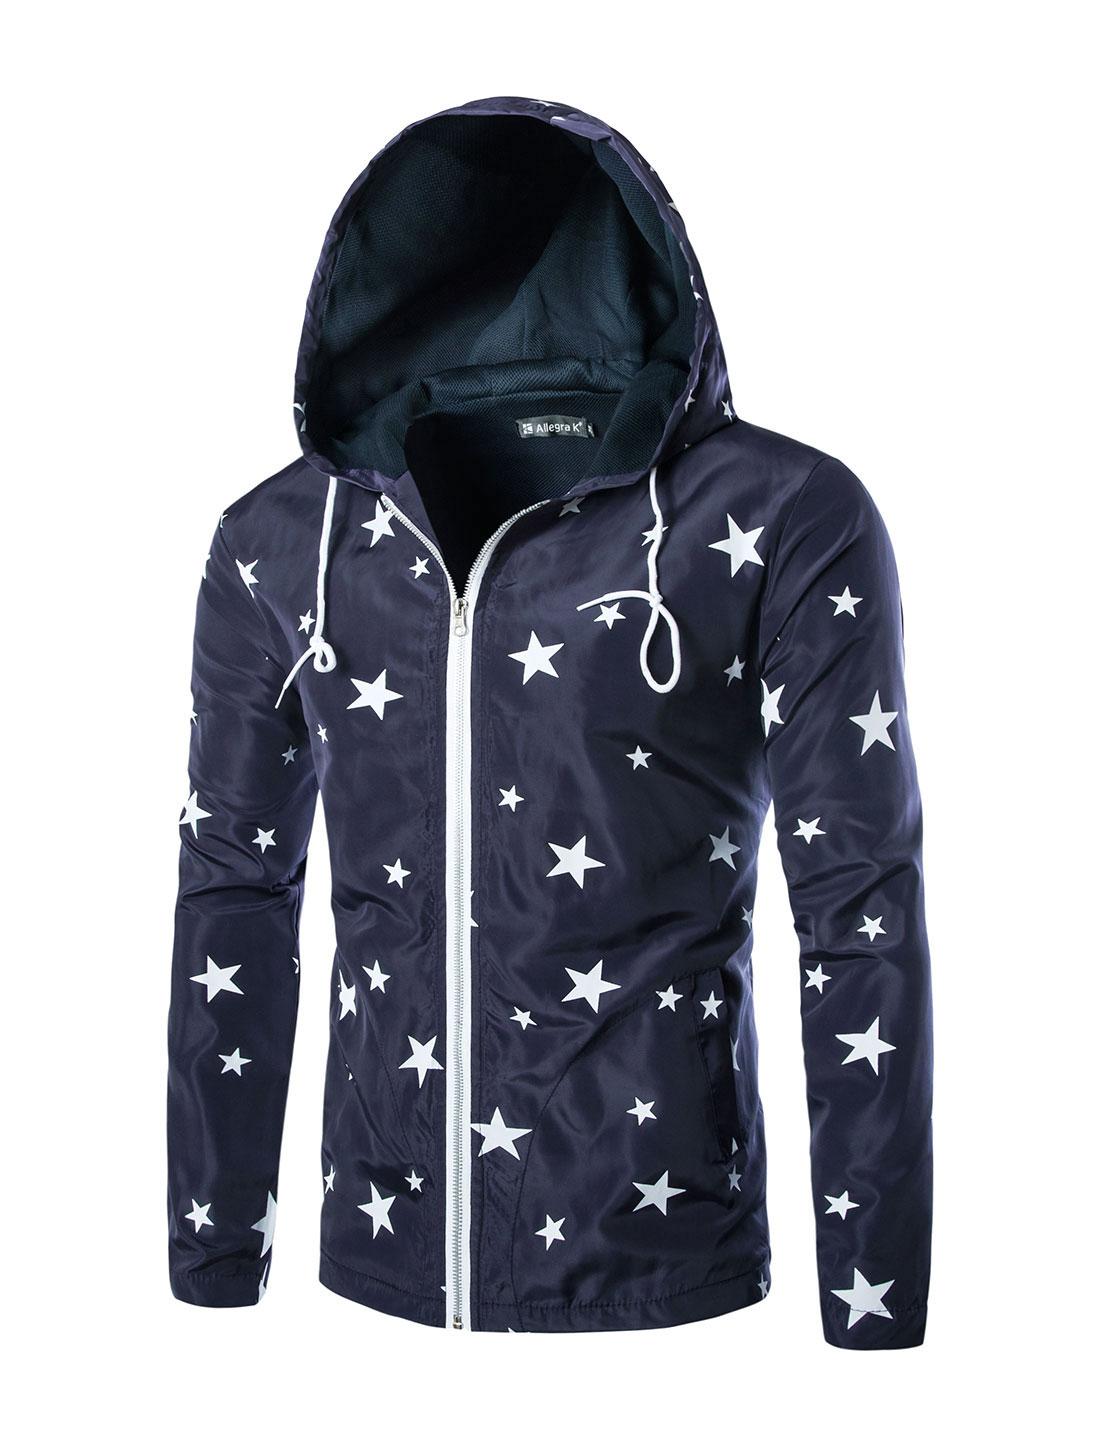 Men Long Sleeve Drawstring Hood Stars Hoodie Jackets Navy Blue M